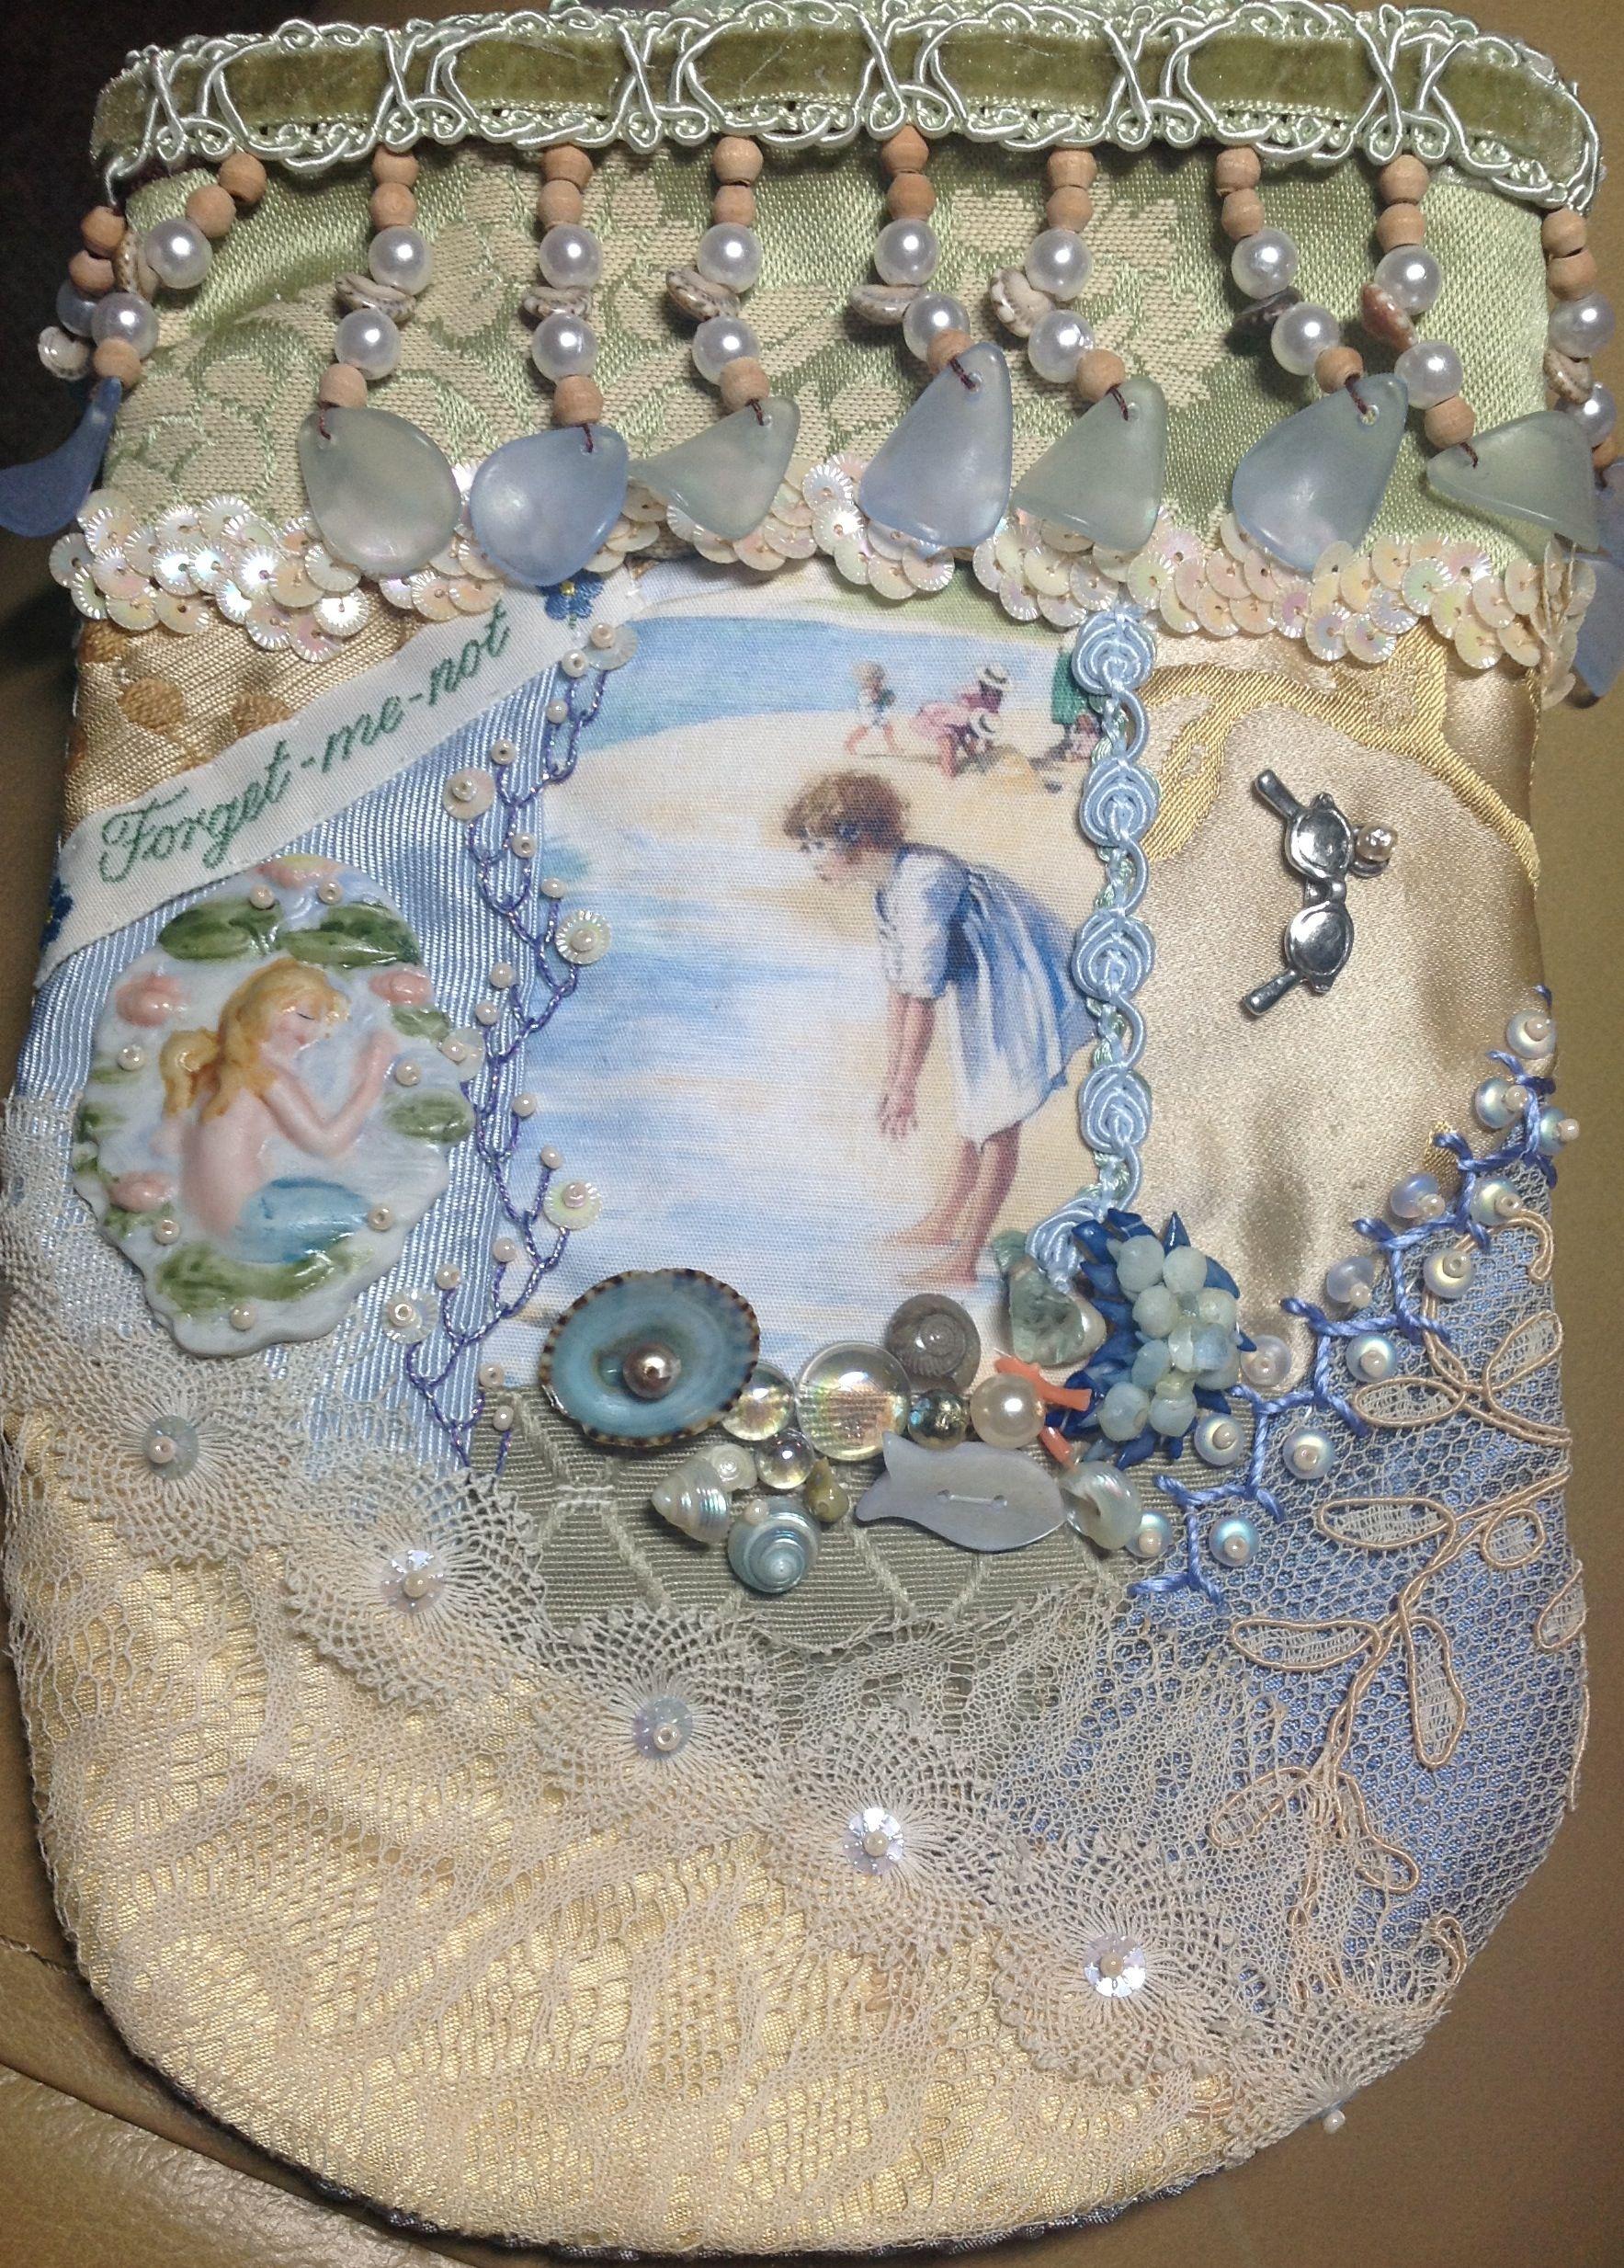 Mermaid tear gathering purse. 8/27/13 Pat Winter